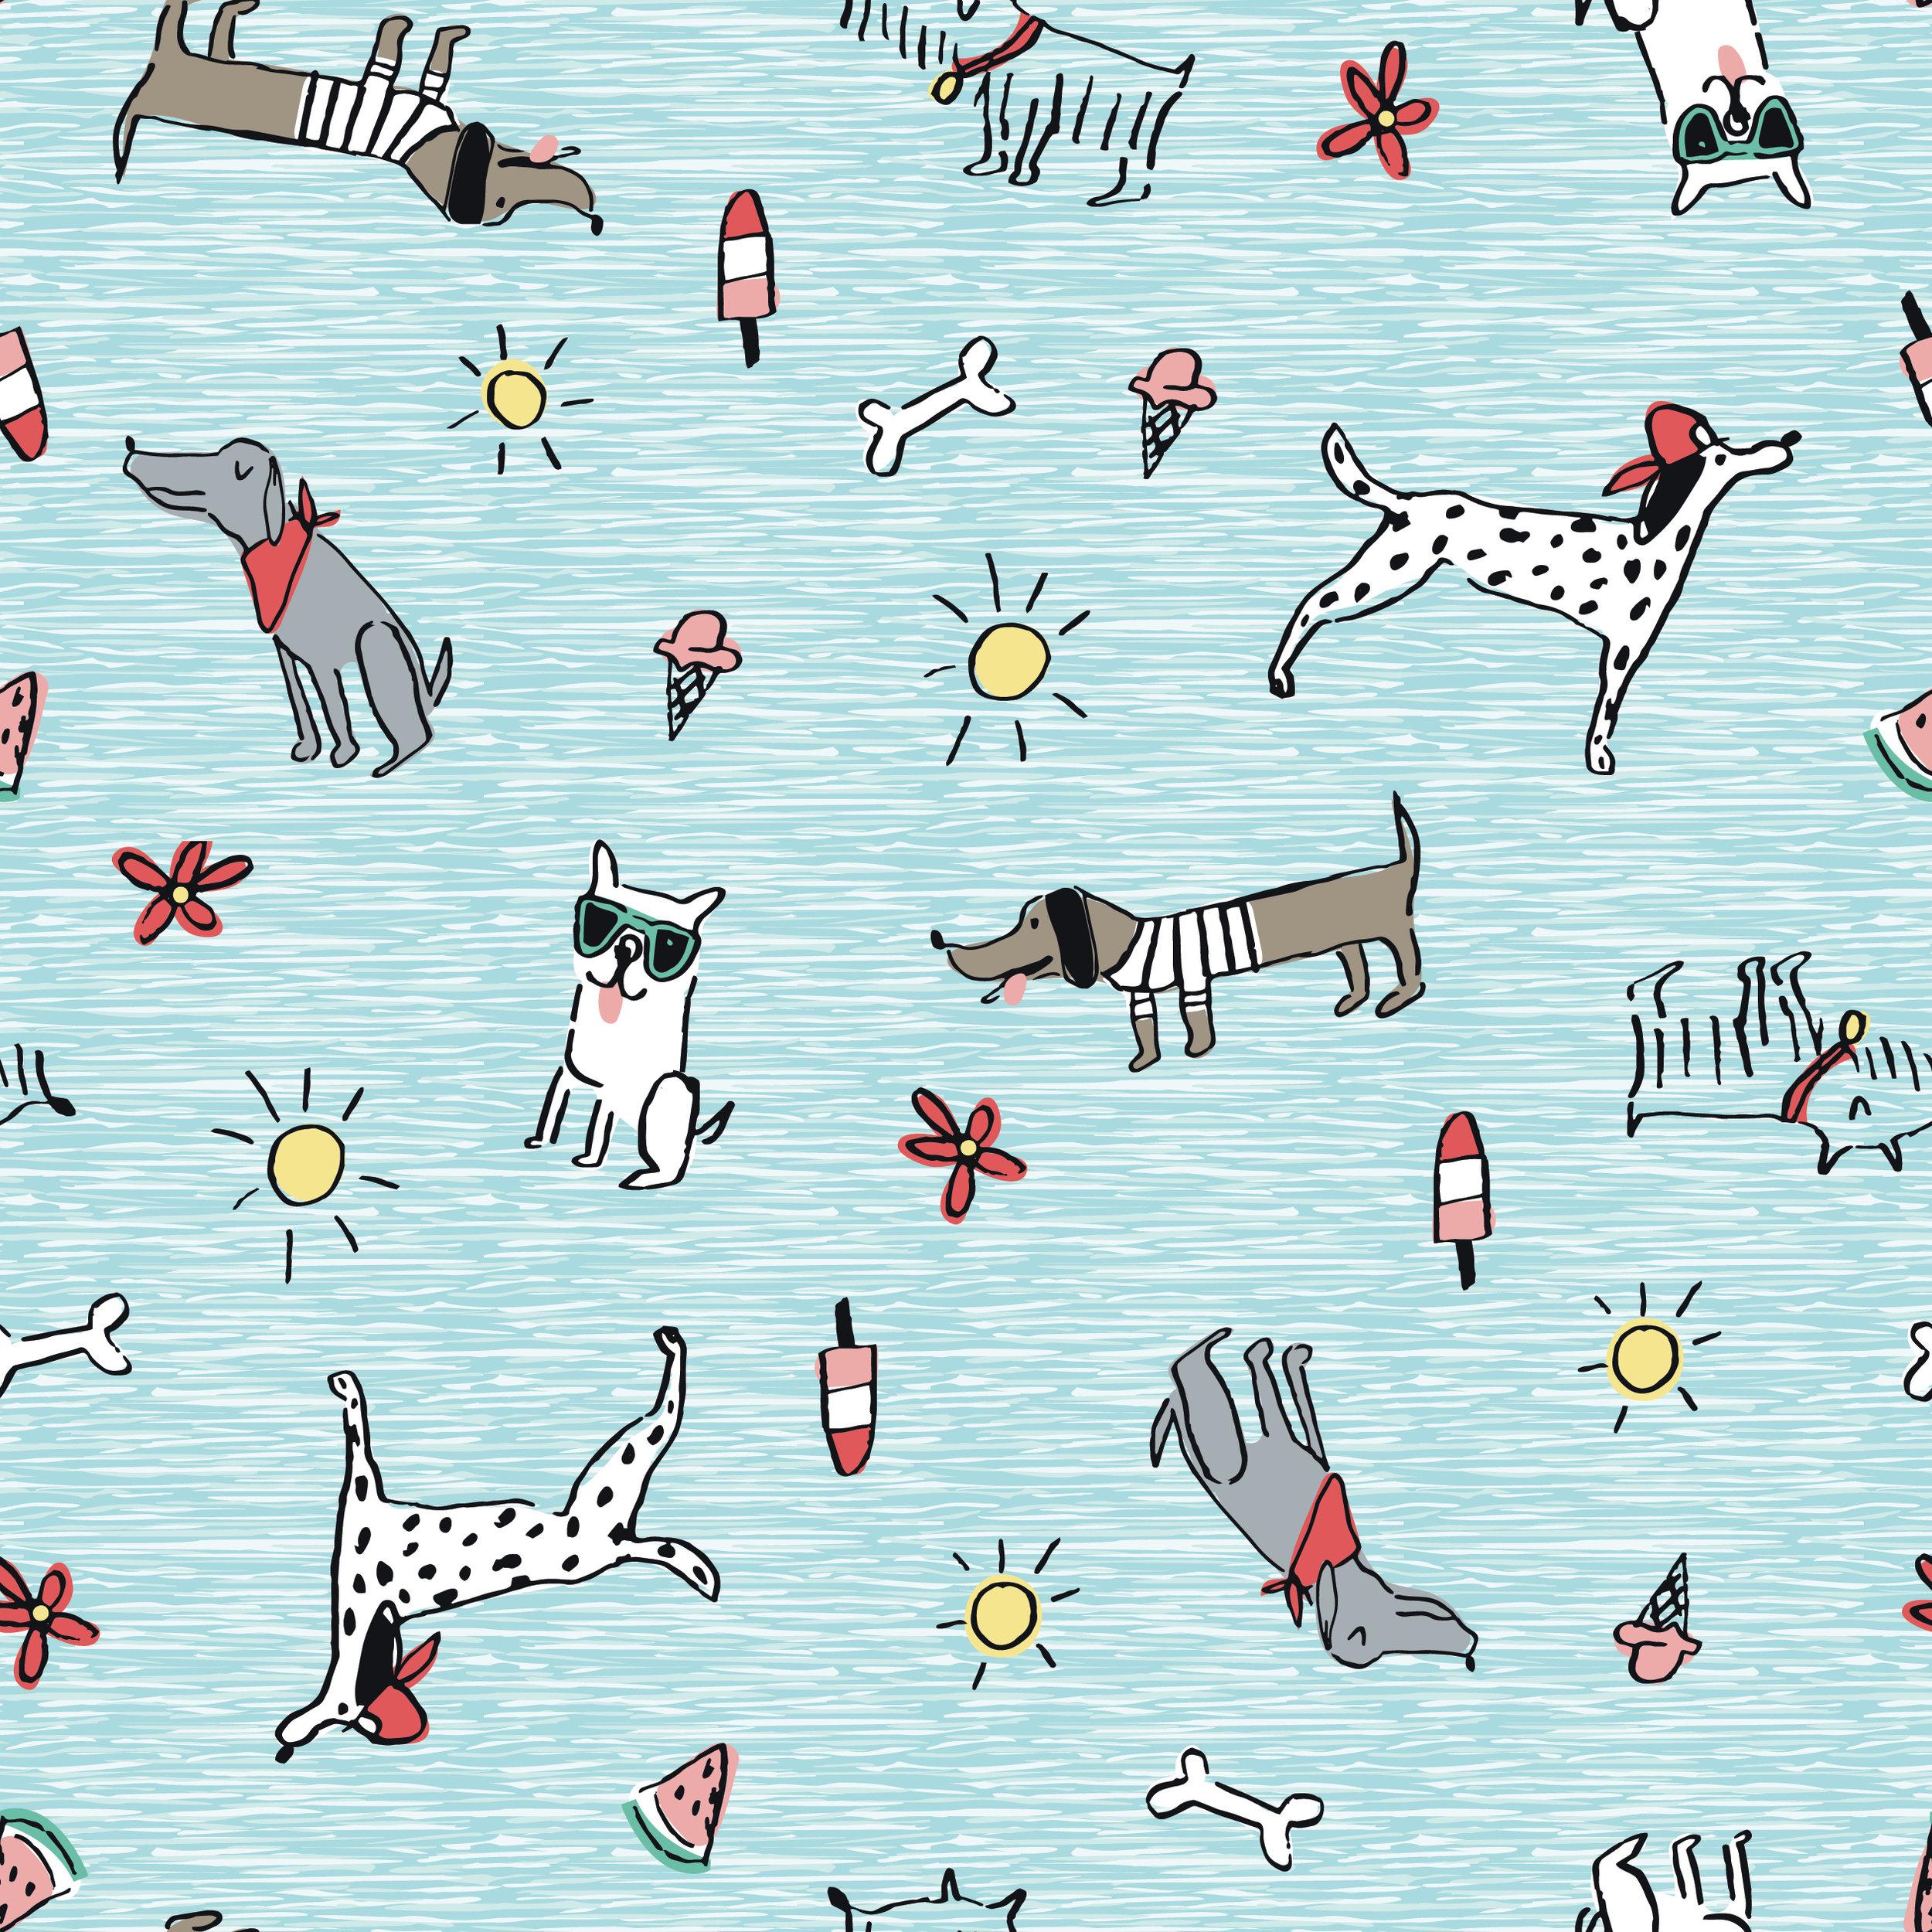 Summer Dogs-S293-01.jpg